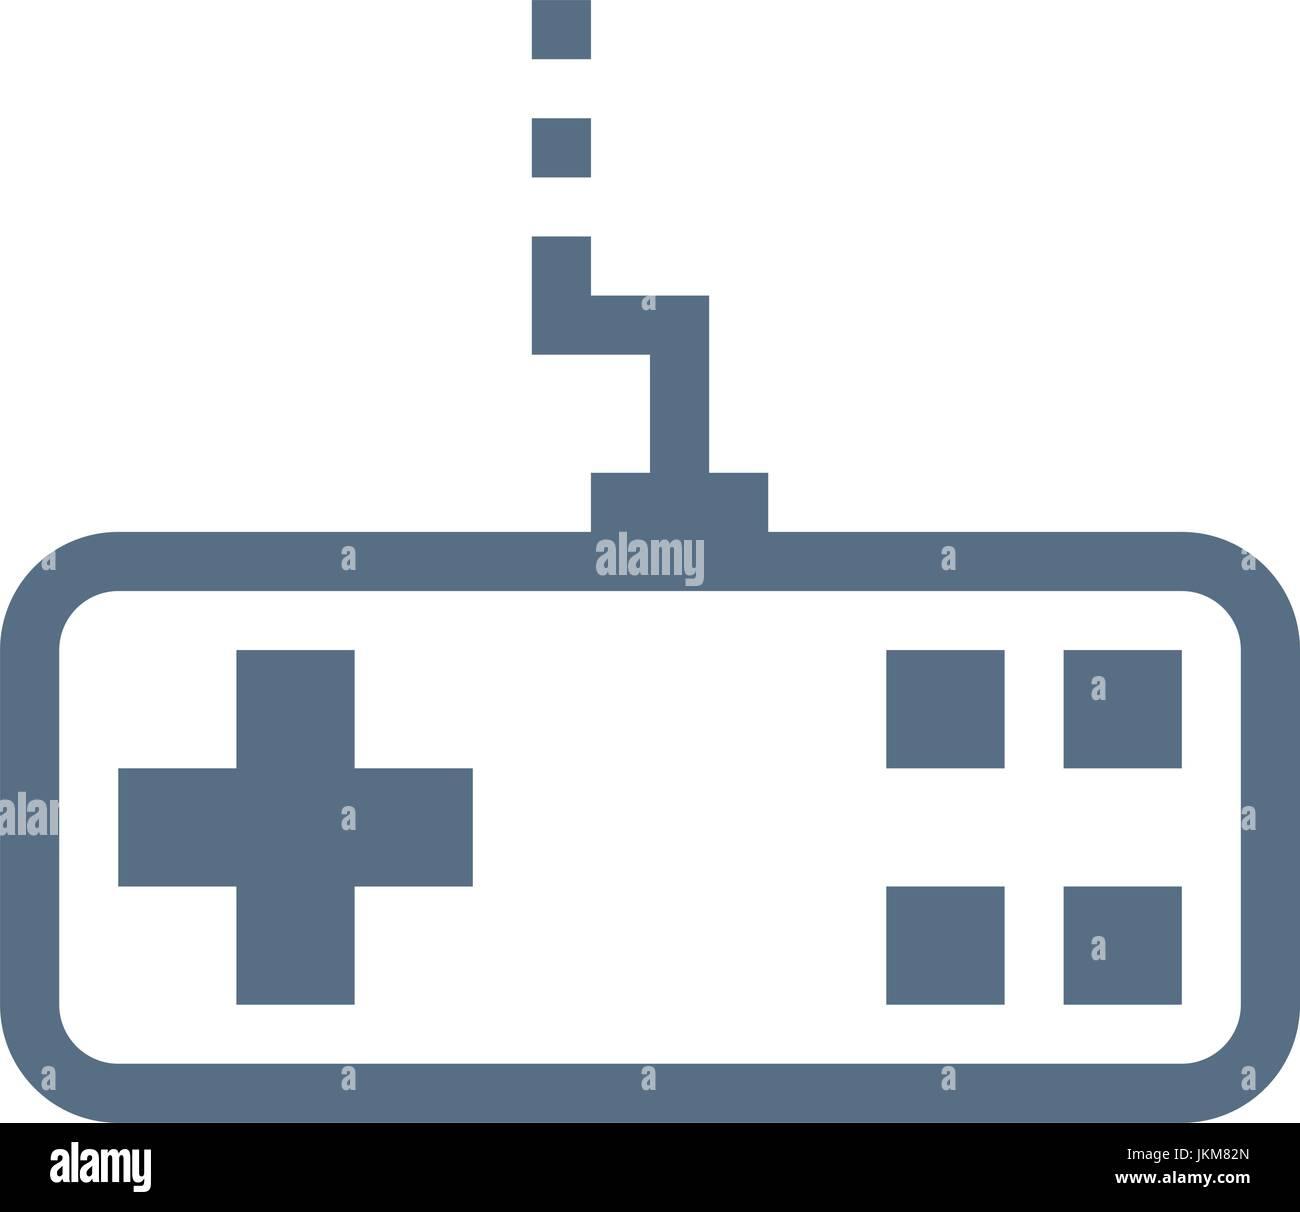 joystick linear vector icon - Stock Image